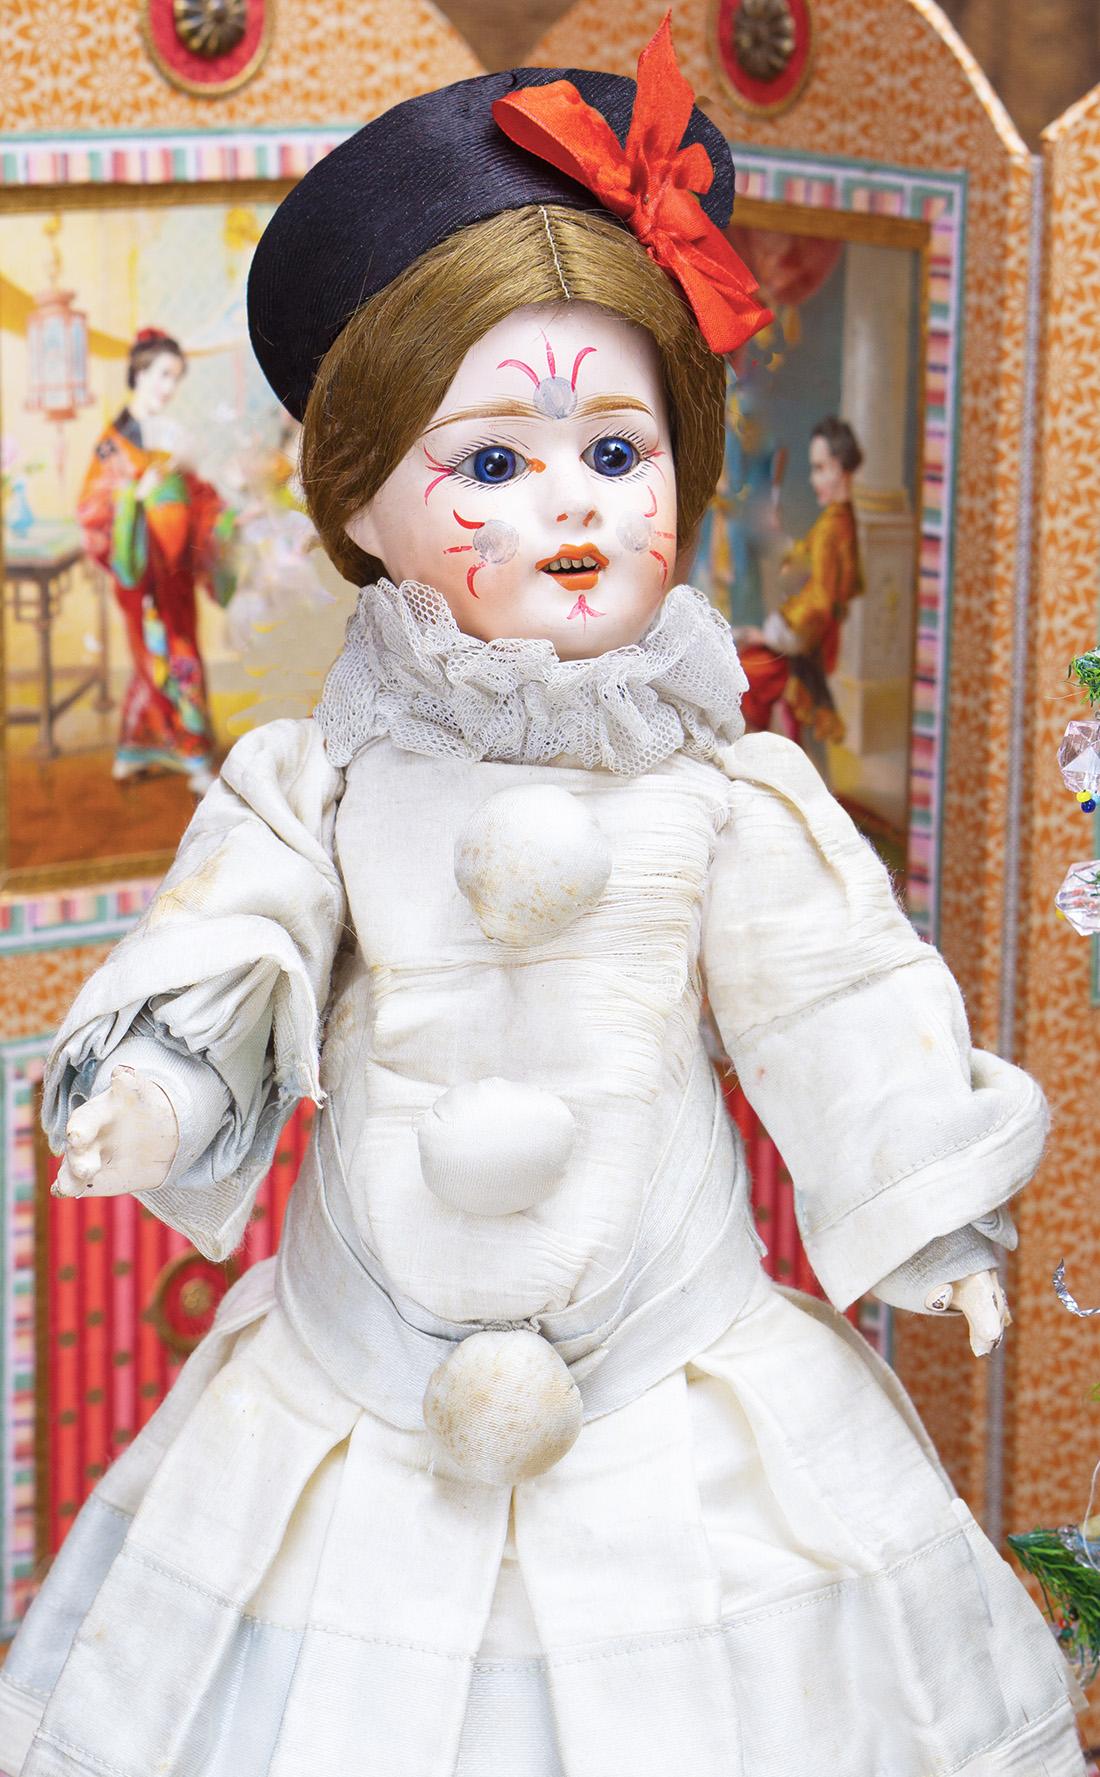 37см Французская кукла Пьеро фирмы Fleischmann & Blodel. 1890е годы